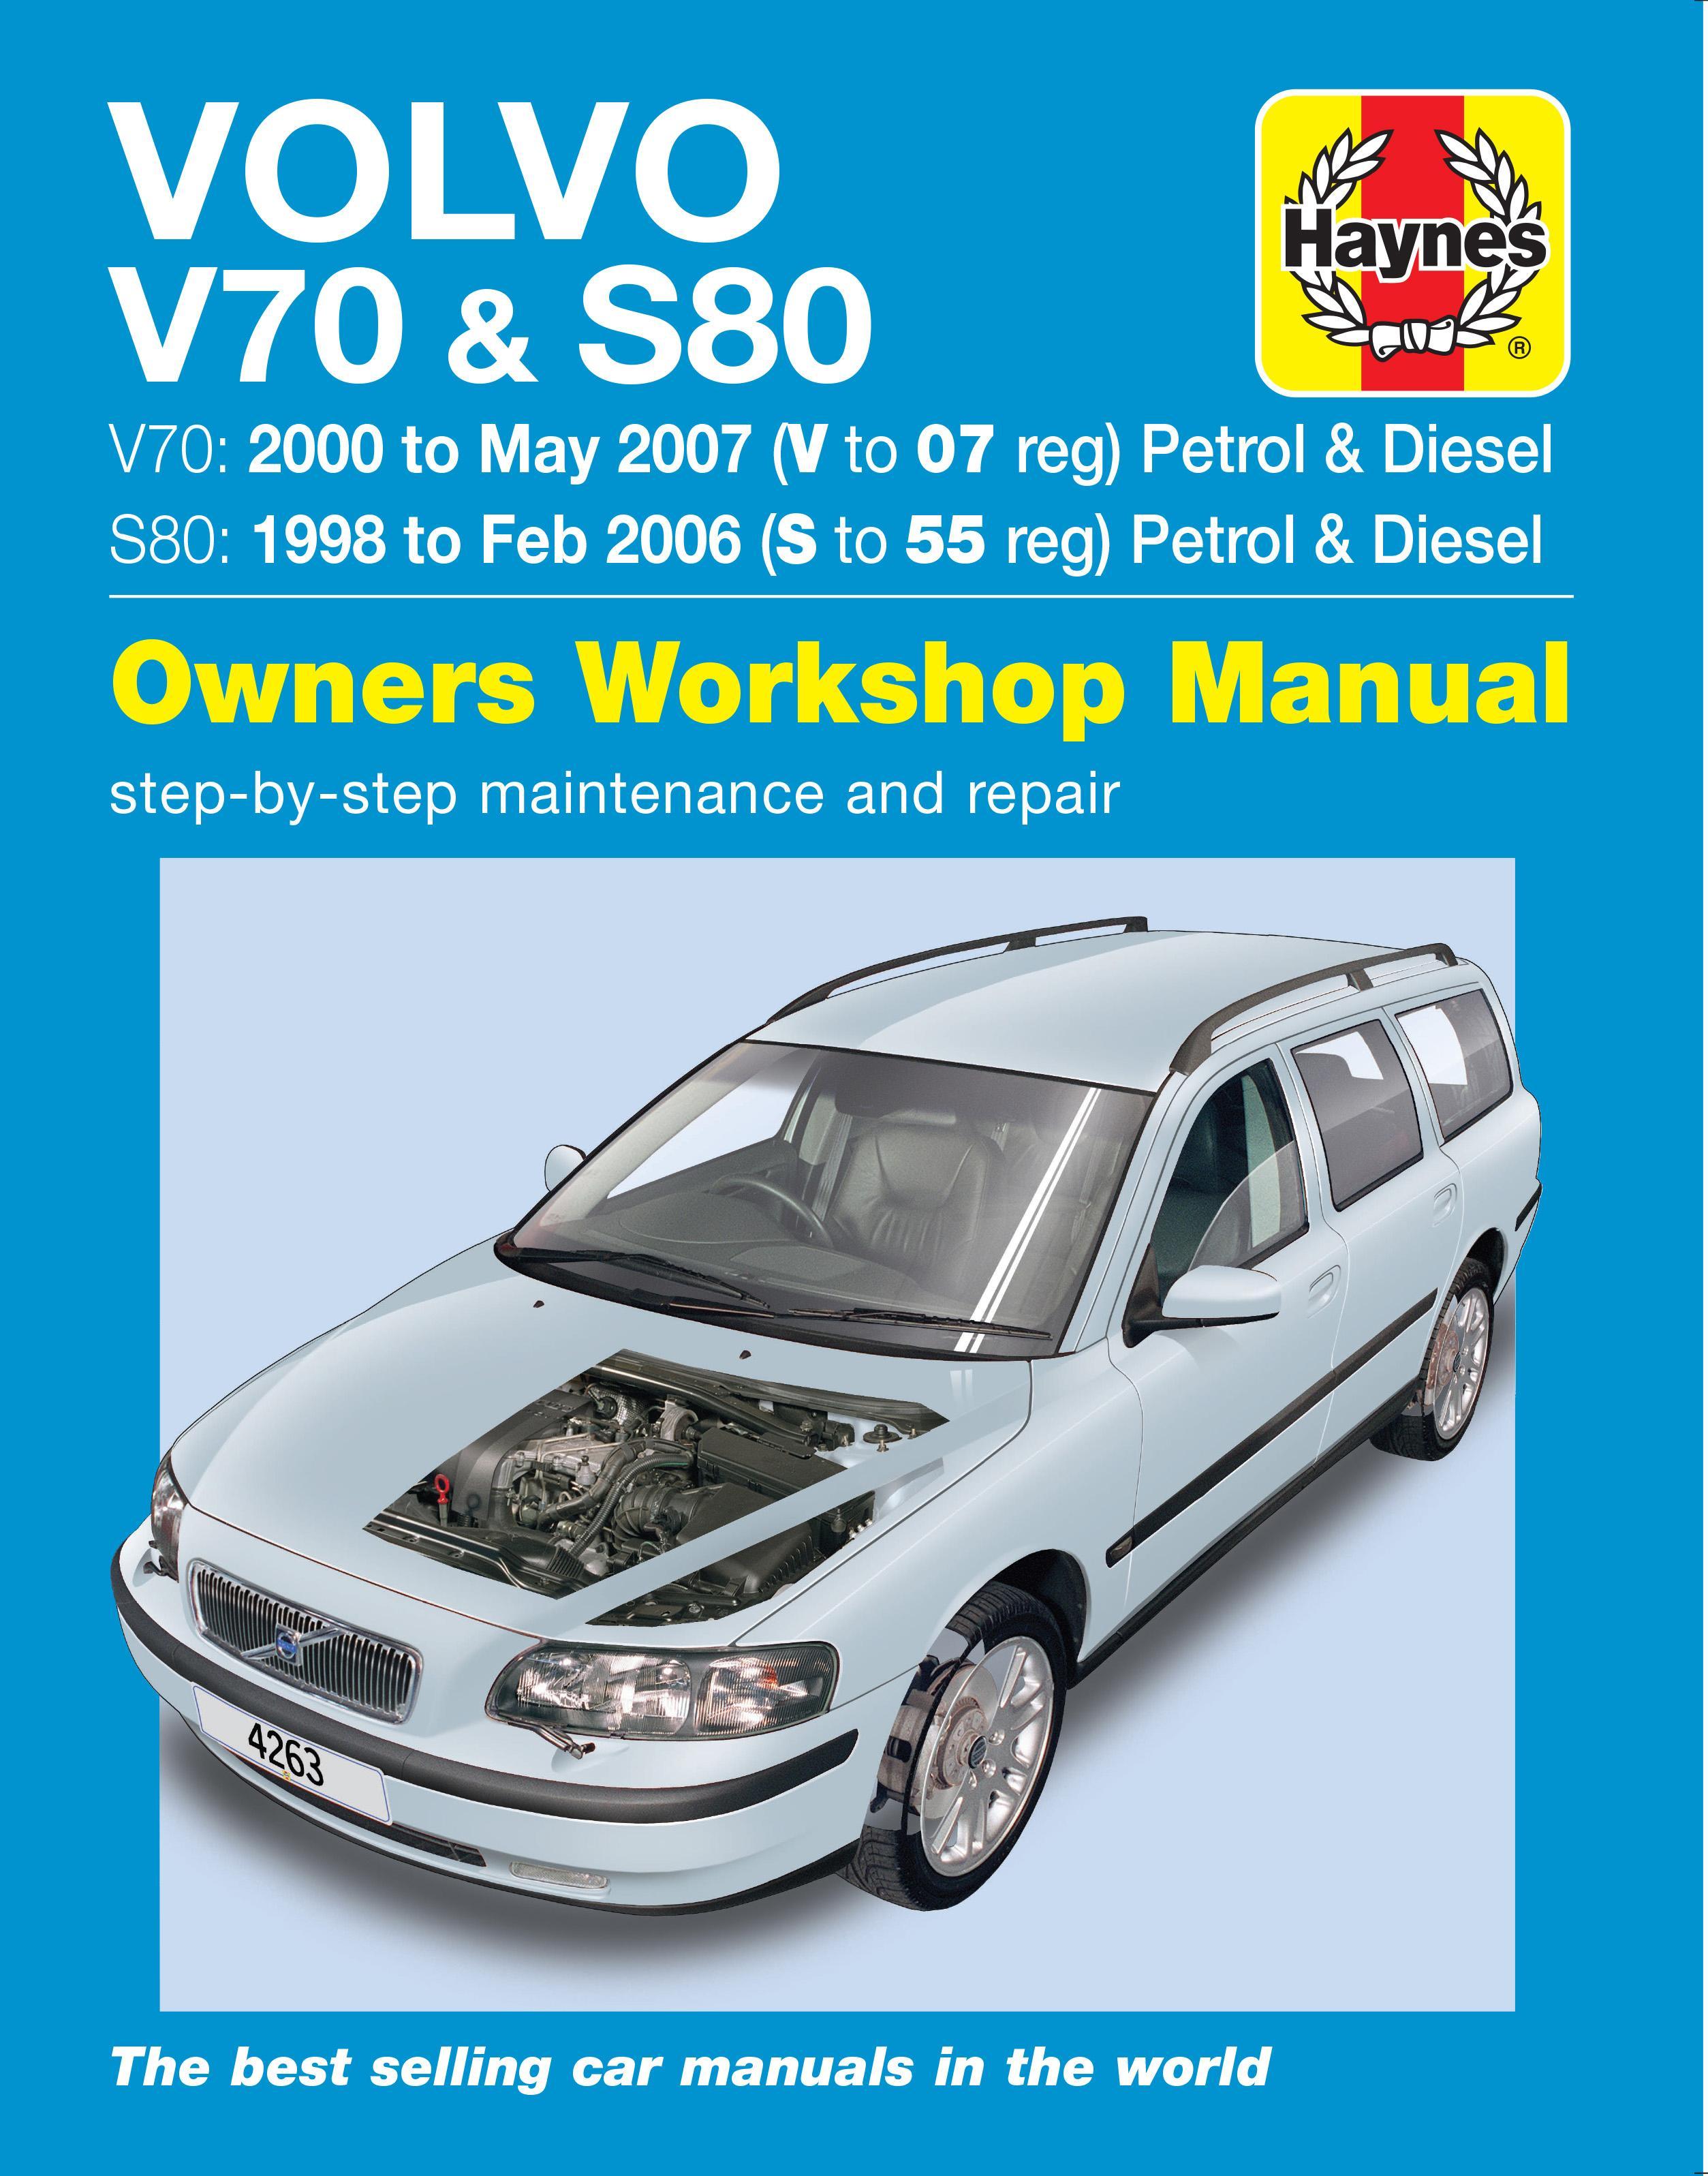 volvo xc70 workshop manual open source user manual u2022 rh dramatic varieties com Store Workshop Manual Otawwa Workshop Manuals